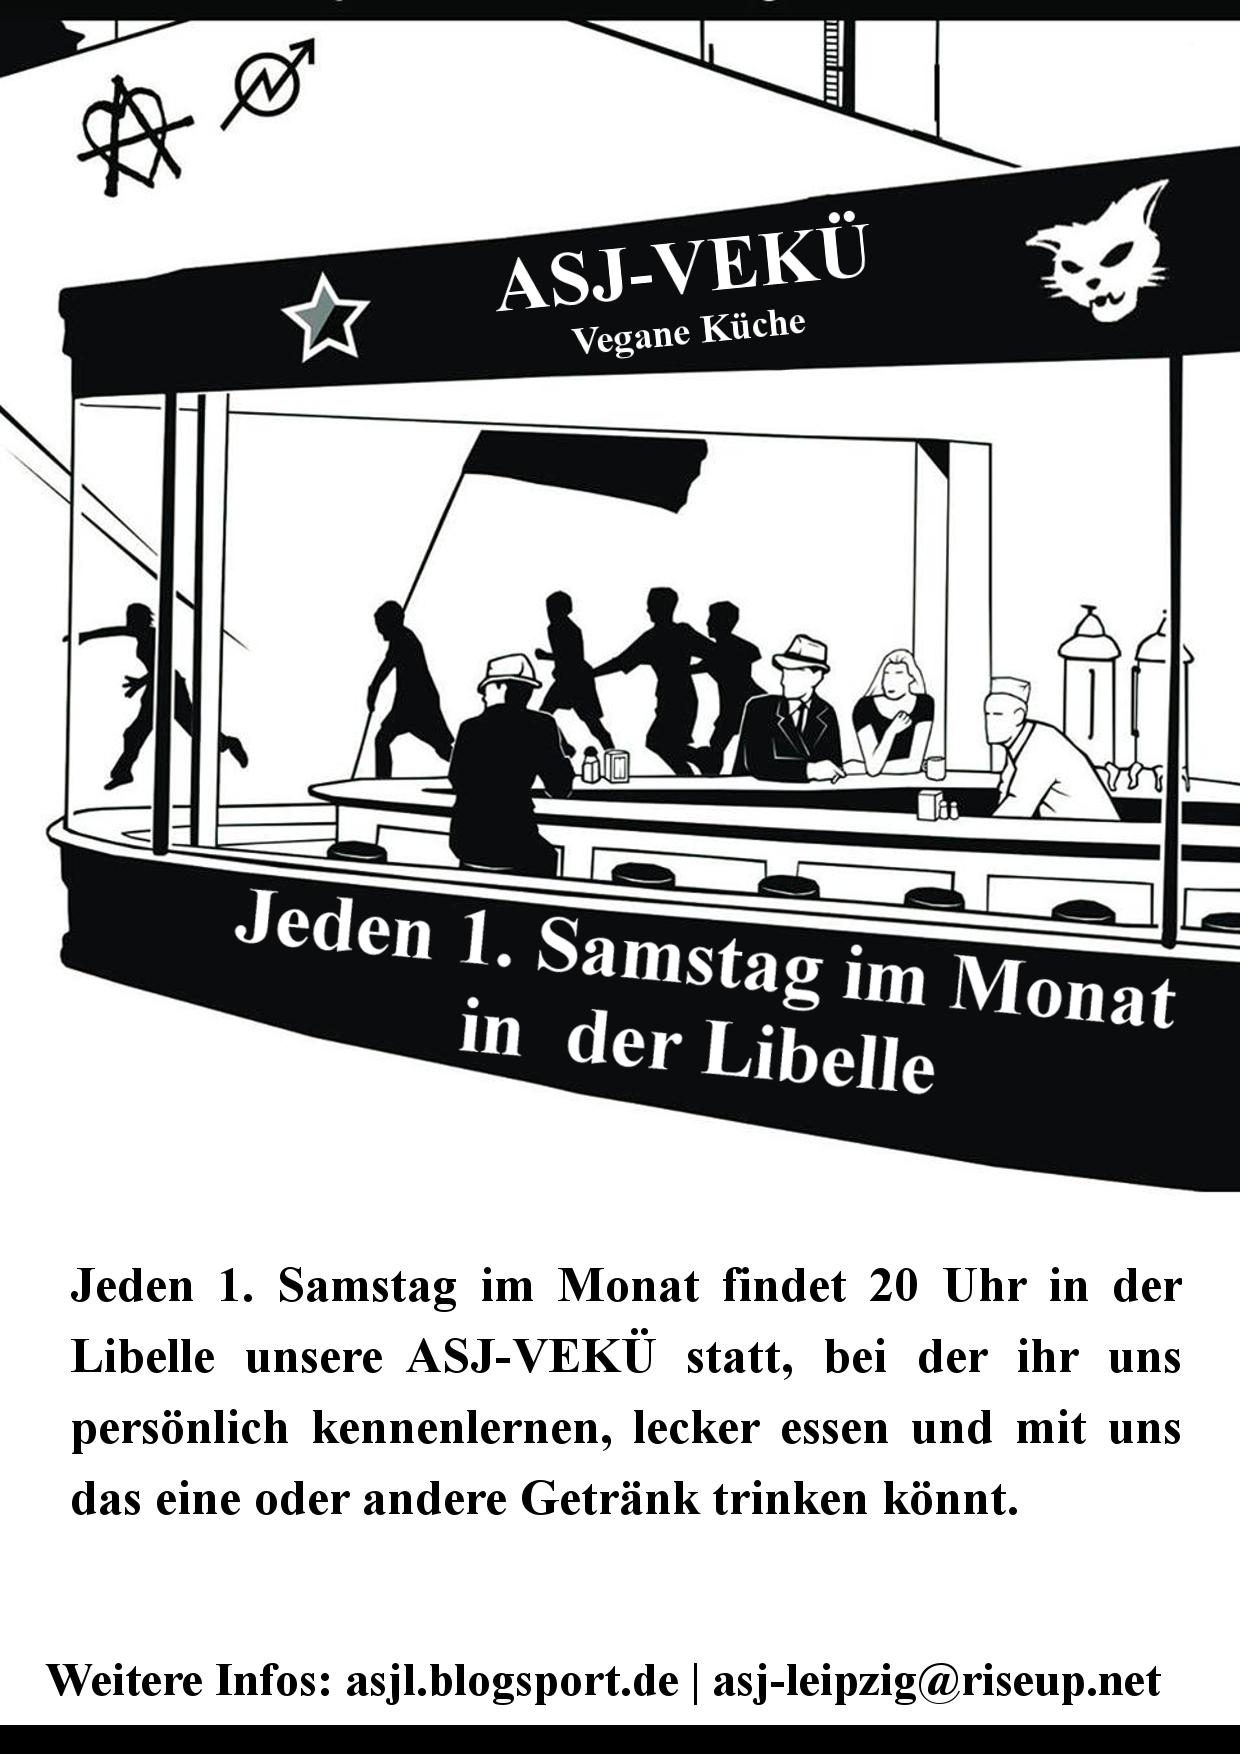 http://asjl.blogsport.de/images/Vek_01.png